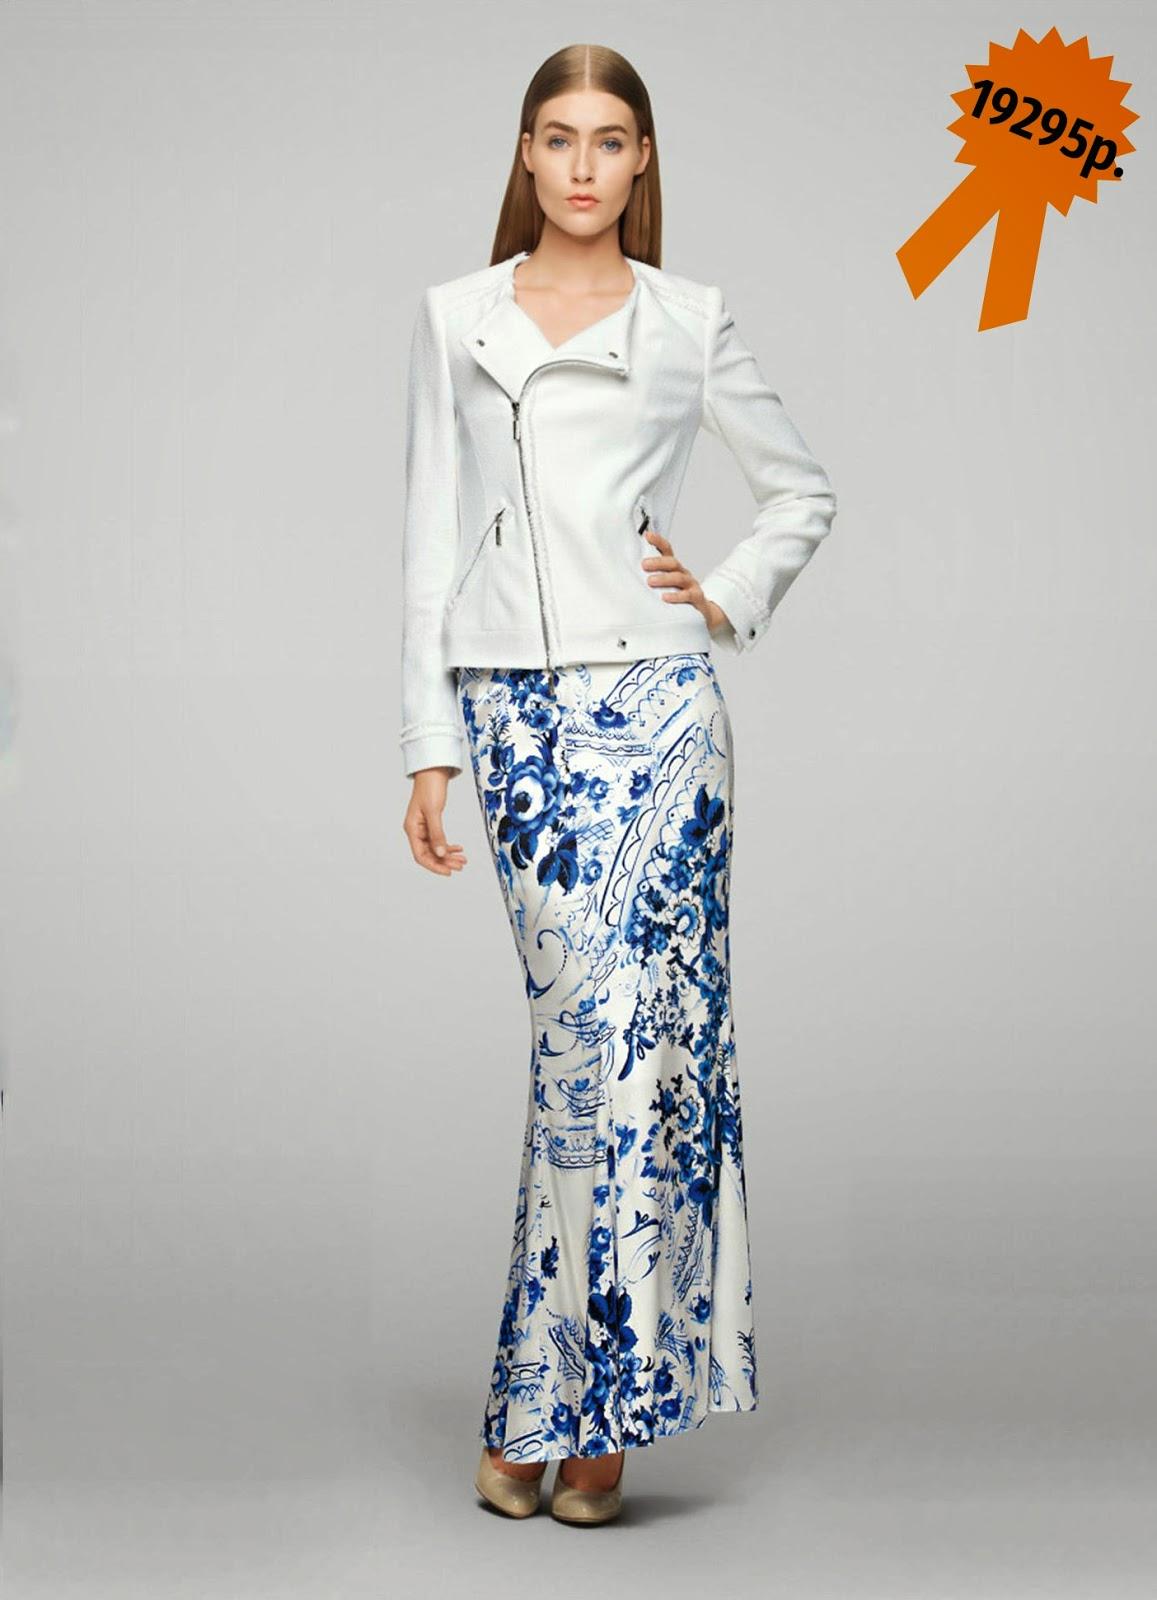 Макси-юбка Elegance ретро стиль